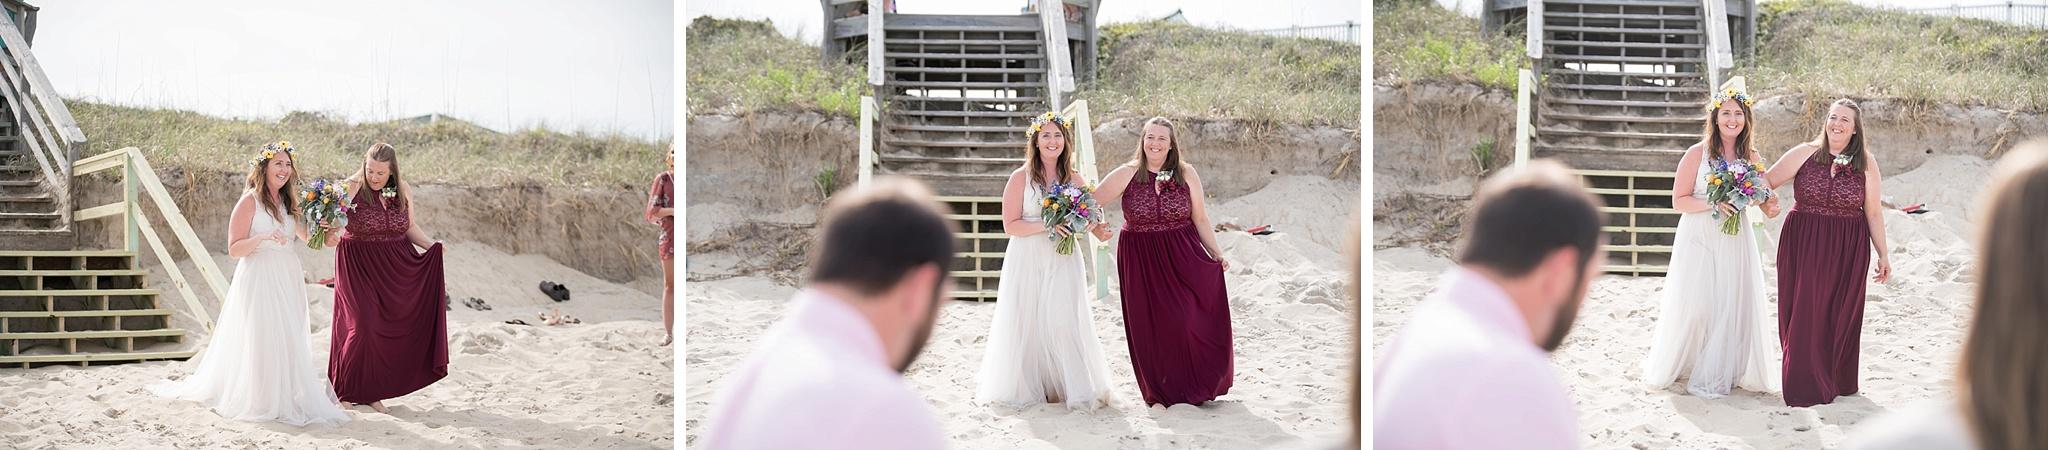 Avon-NC-Wedding-Photographer-192.jpg